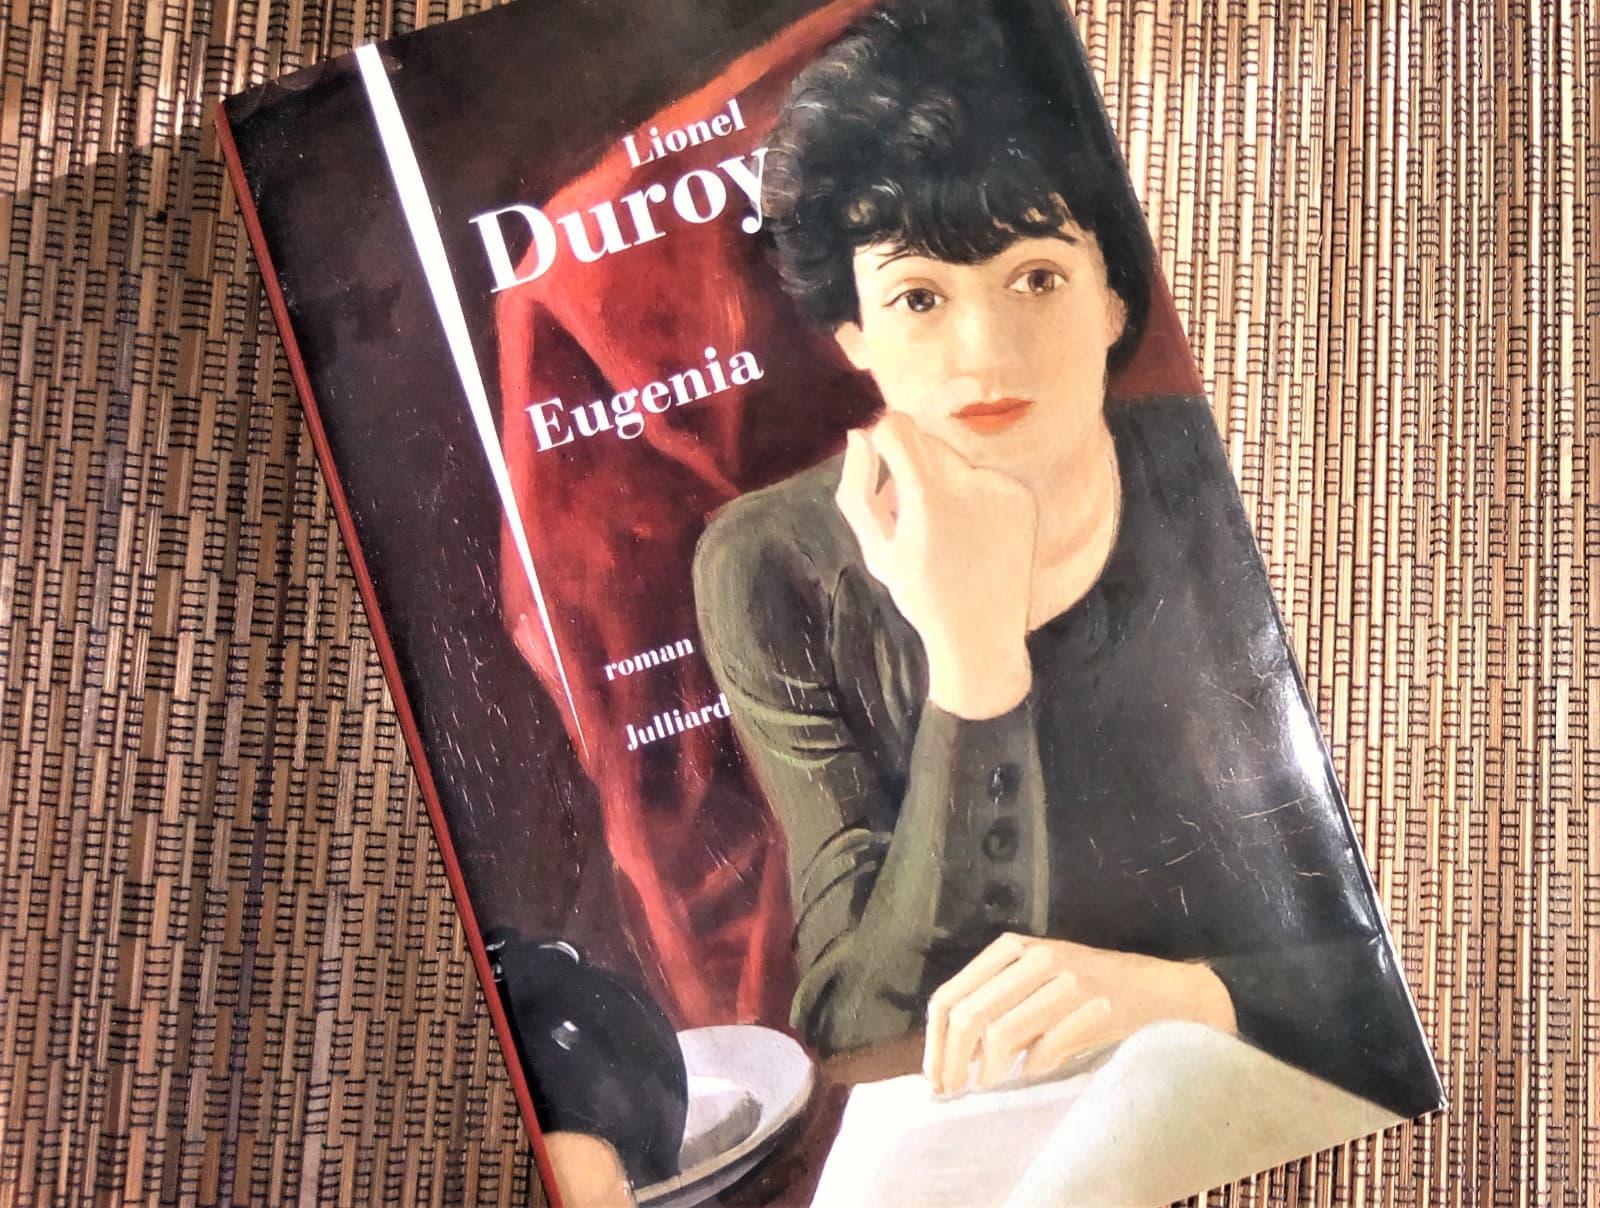 eugenia de Lionel Duroy éditions julliard